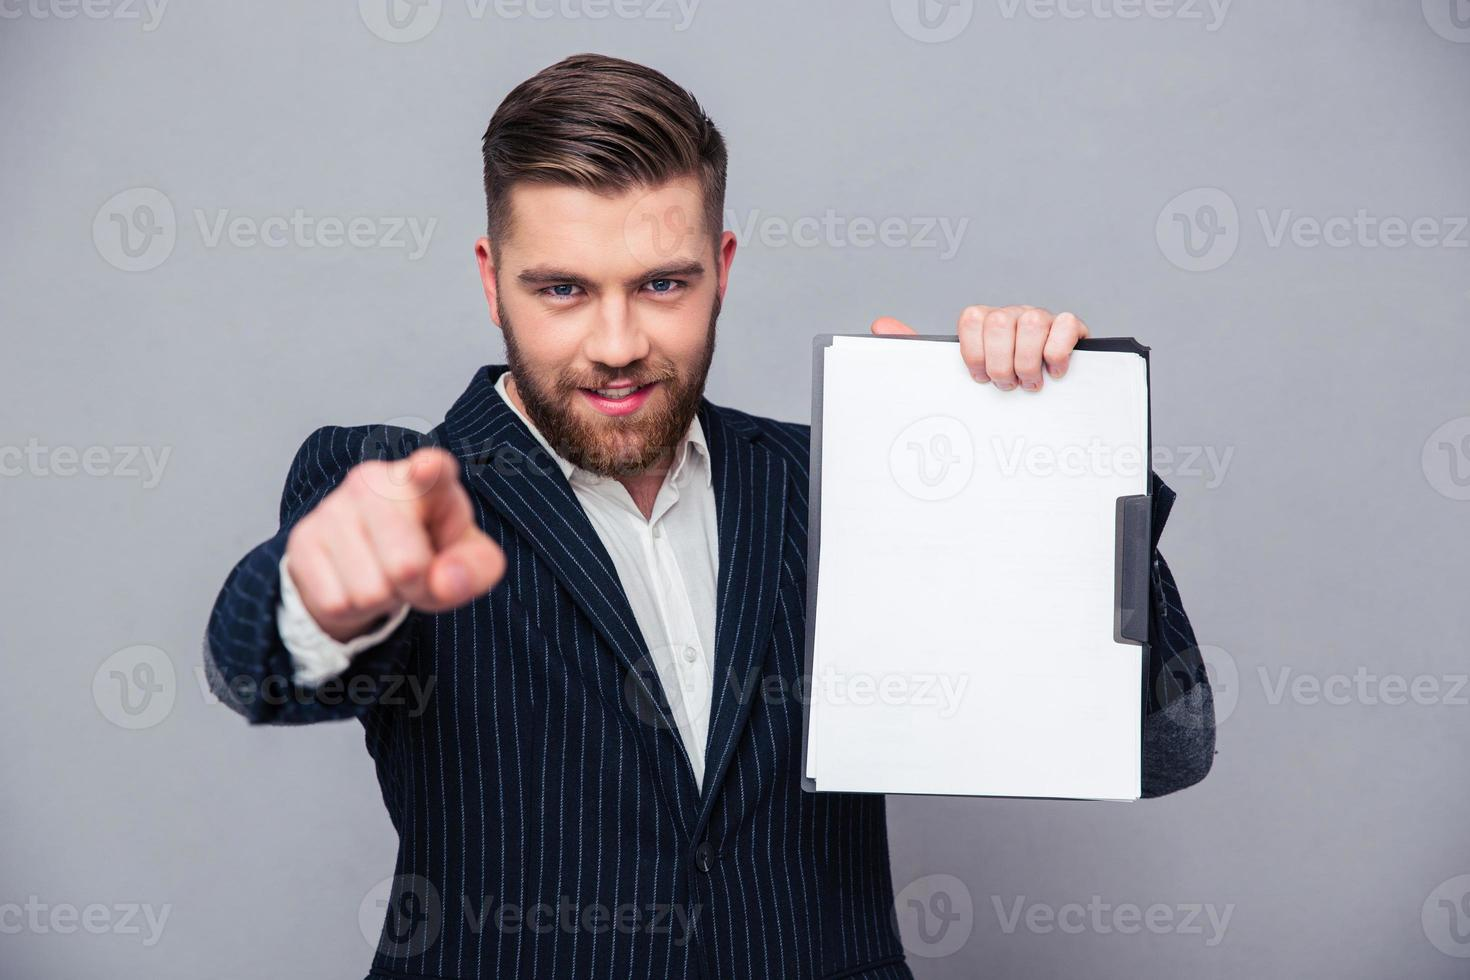 affärsman pekande finger mot kameran foto